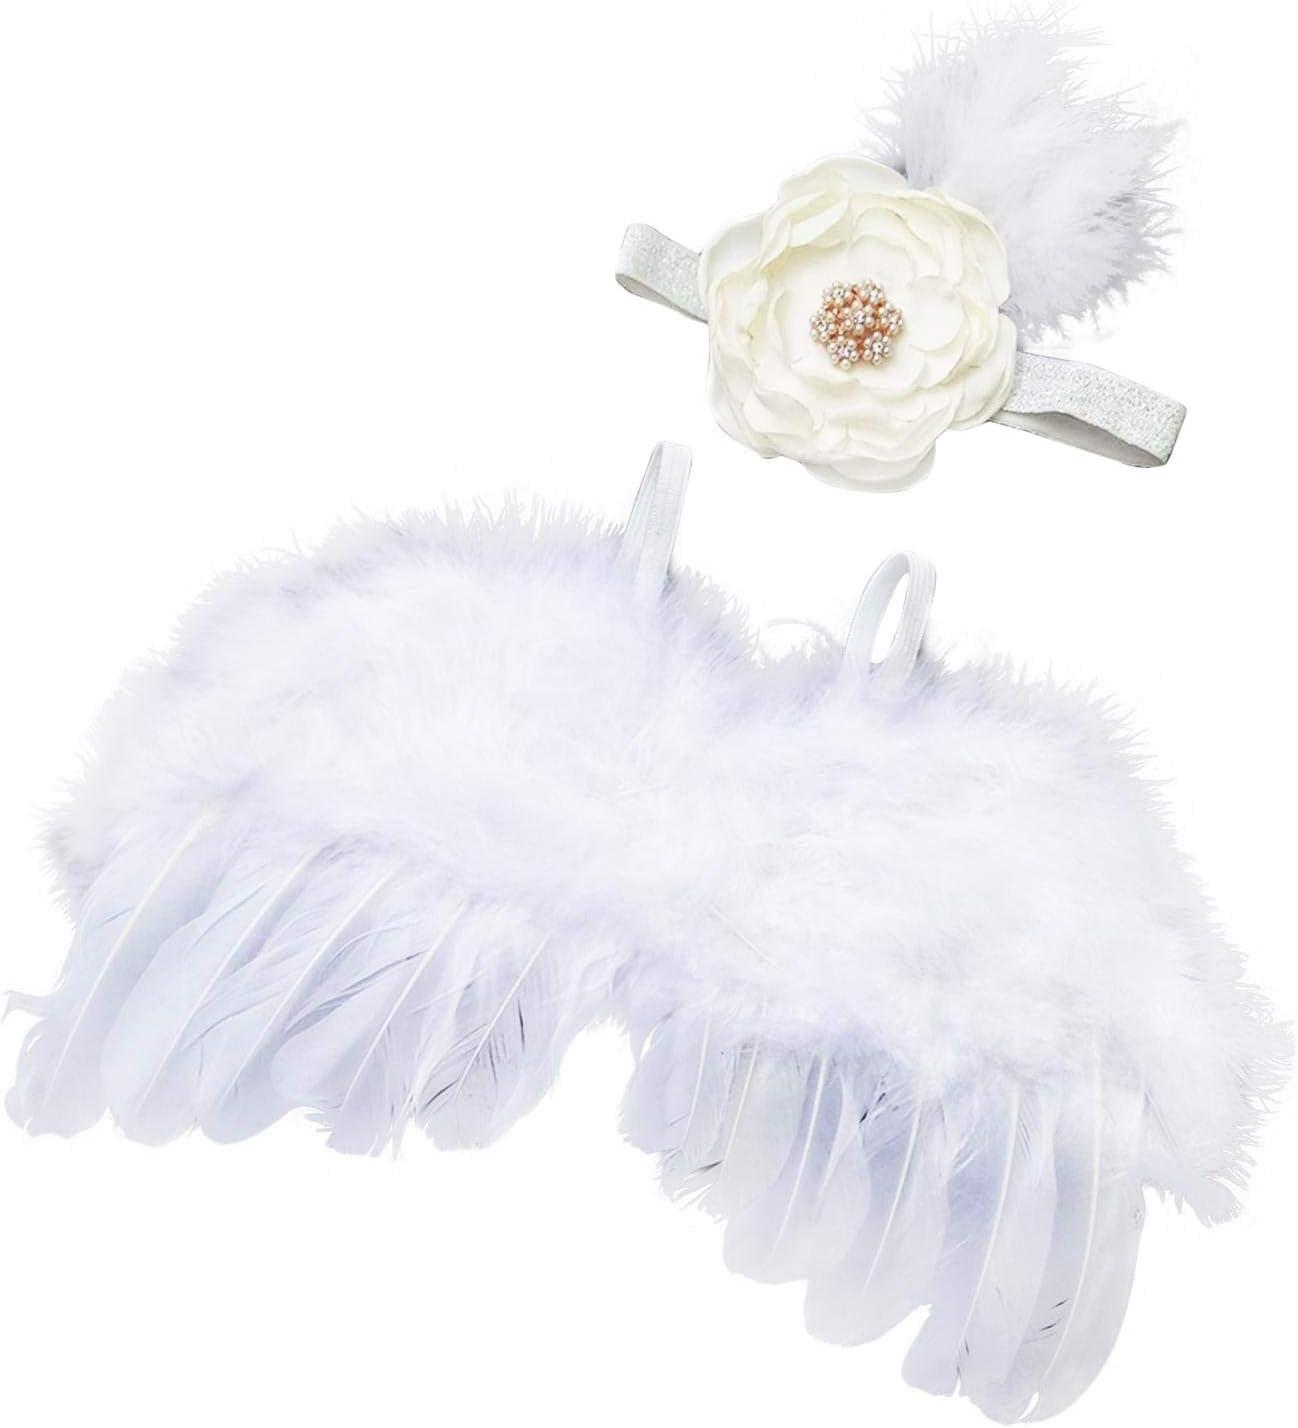 depot NSVJVY Newborn Photography Angel Wings Baby security Gi w Flower Headband